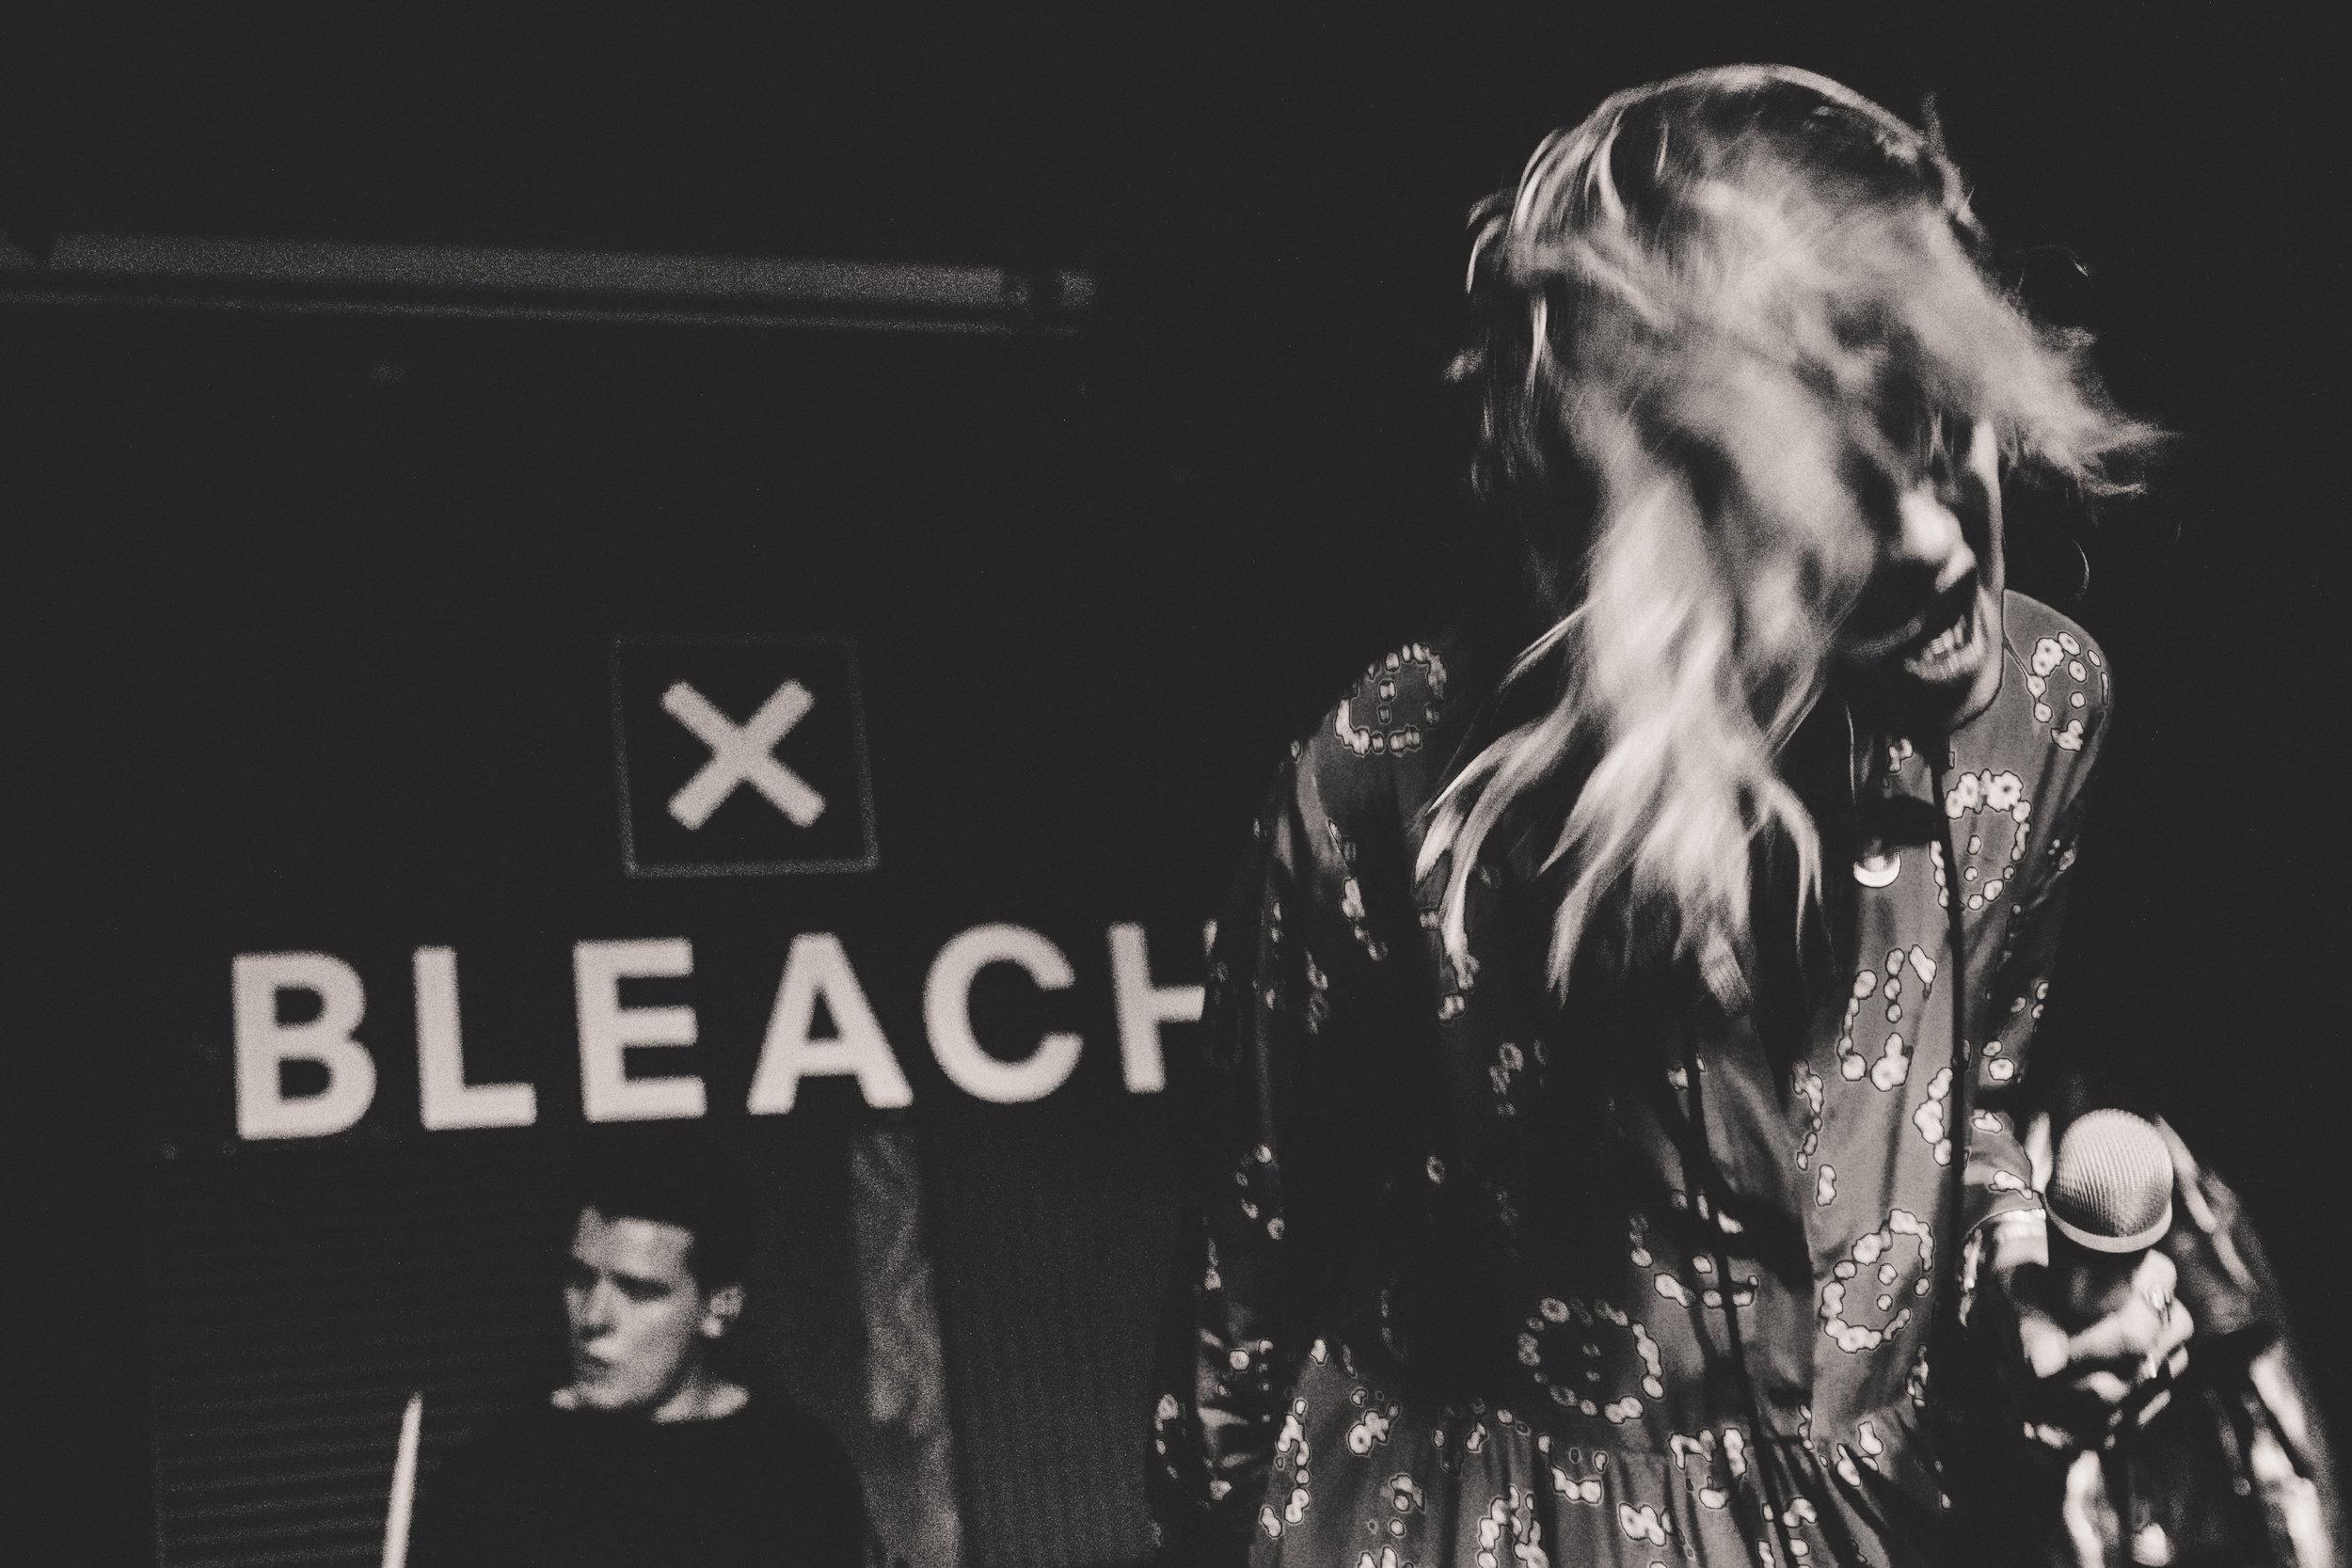 Anteros - Bleach - Great Escape Festival 2017 - Ant Adams-61.jpg